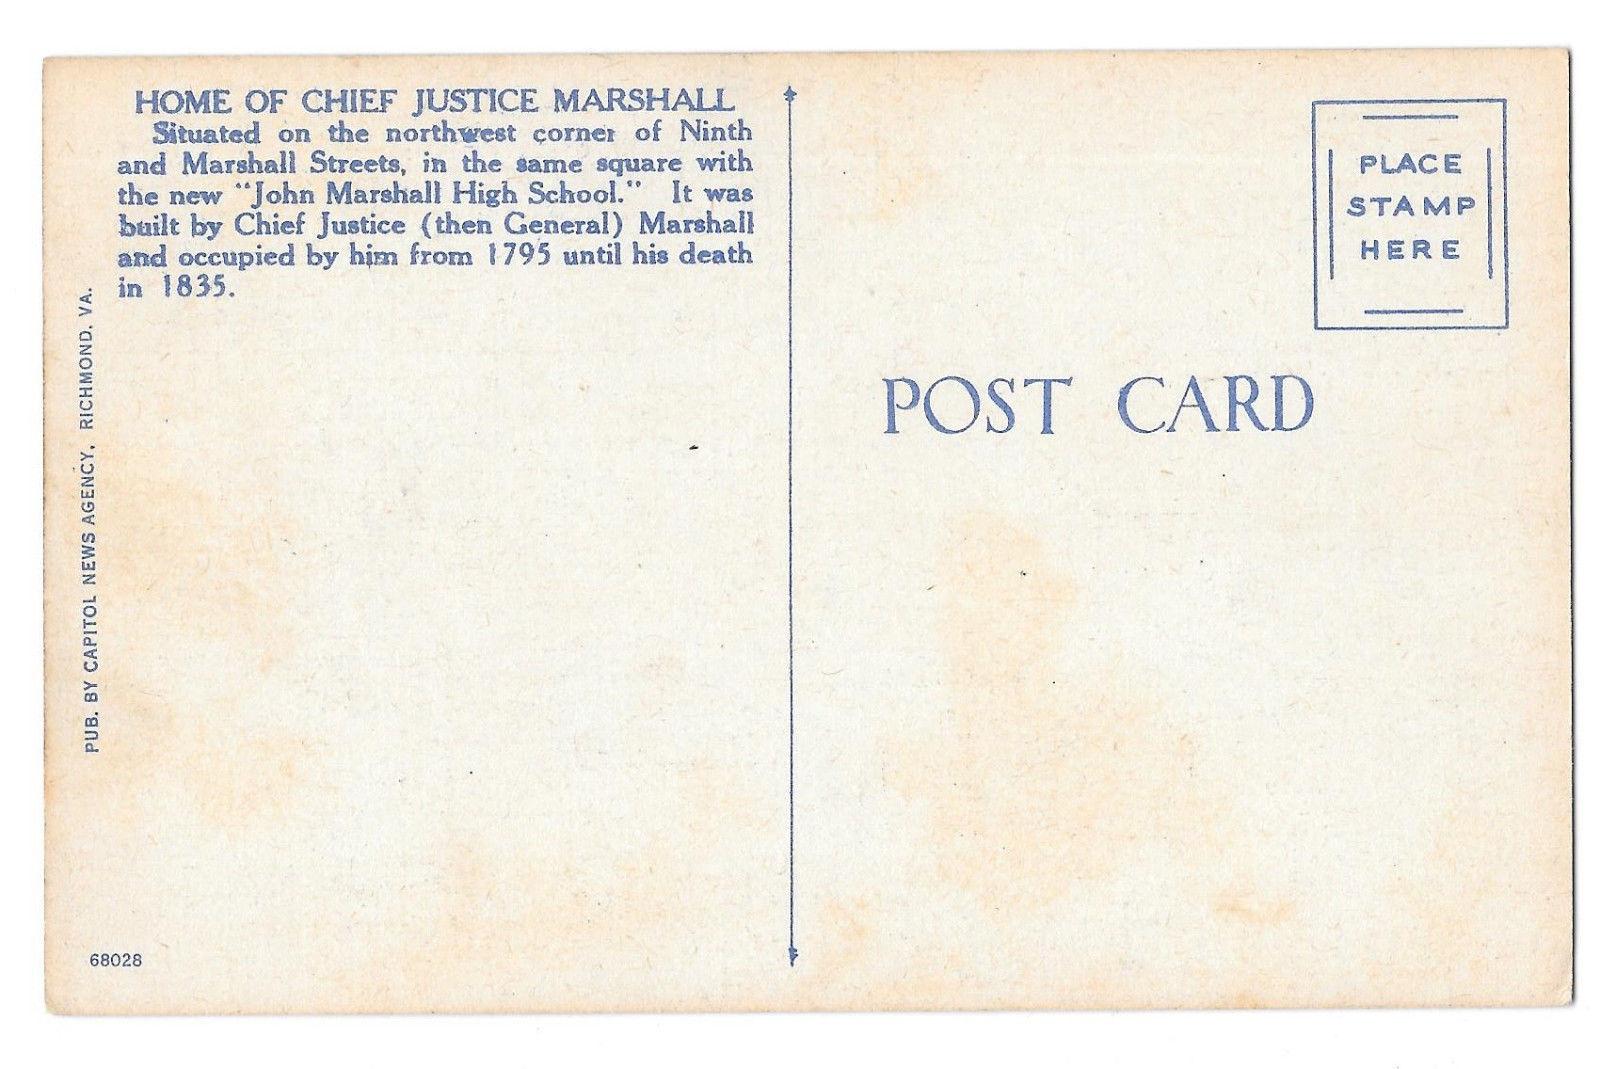 VA Richmond Home Chief Justice Marshall and High School Vtg Linen Postcard